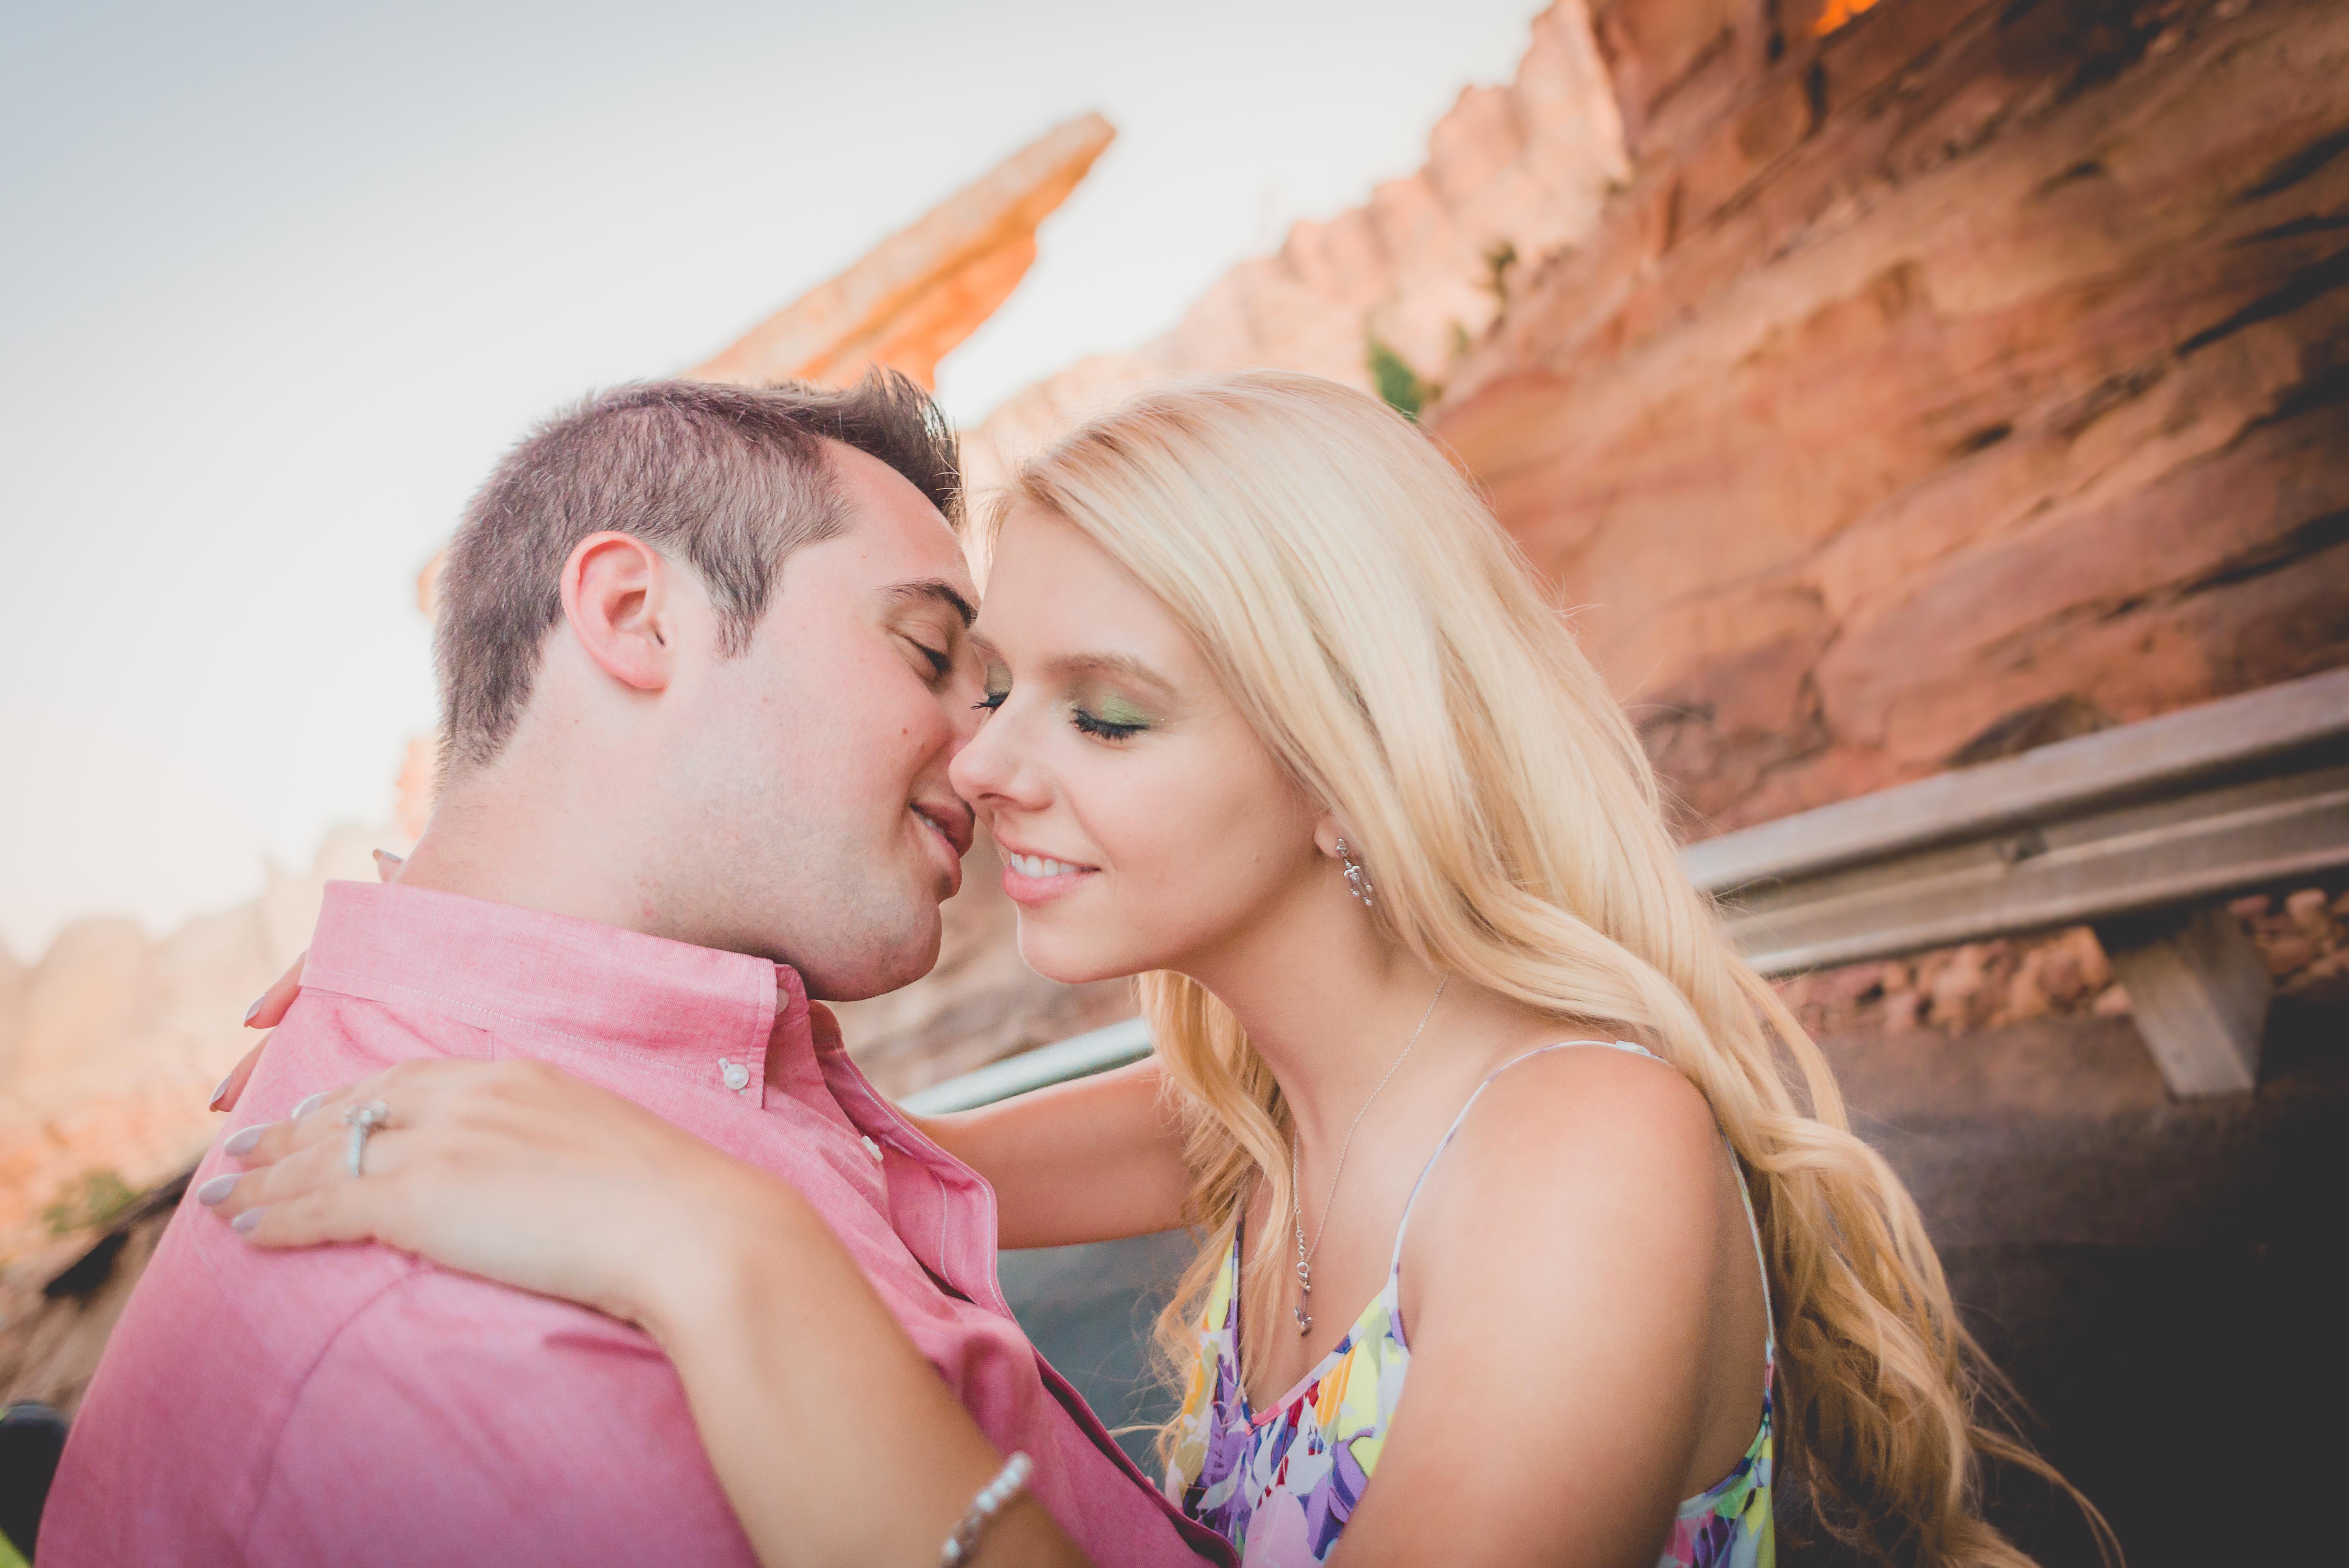 Anthony and Amanda in California Adventure Park at Disneyland